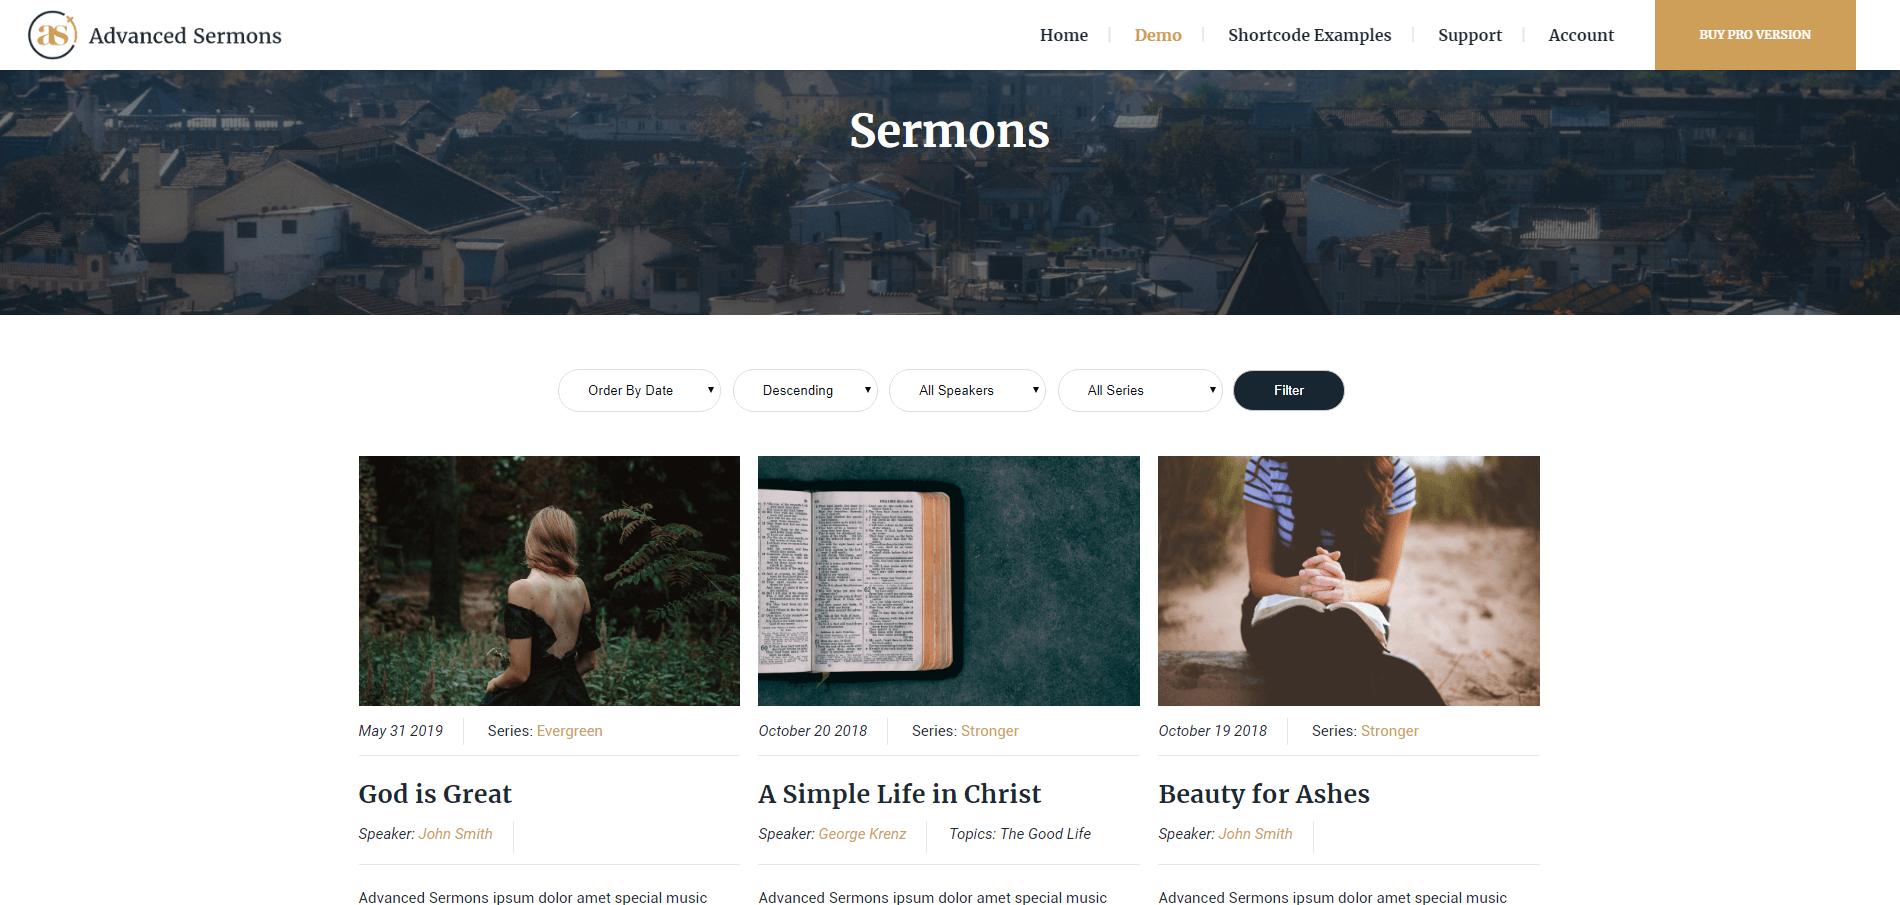 Advanced Sermons Archive